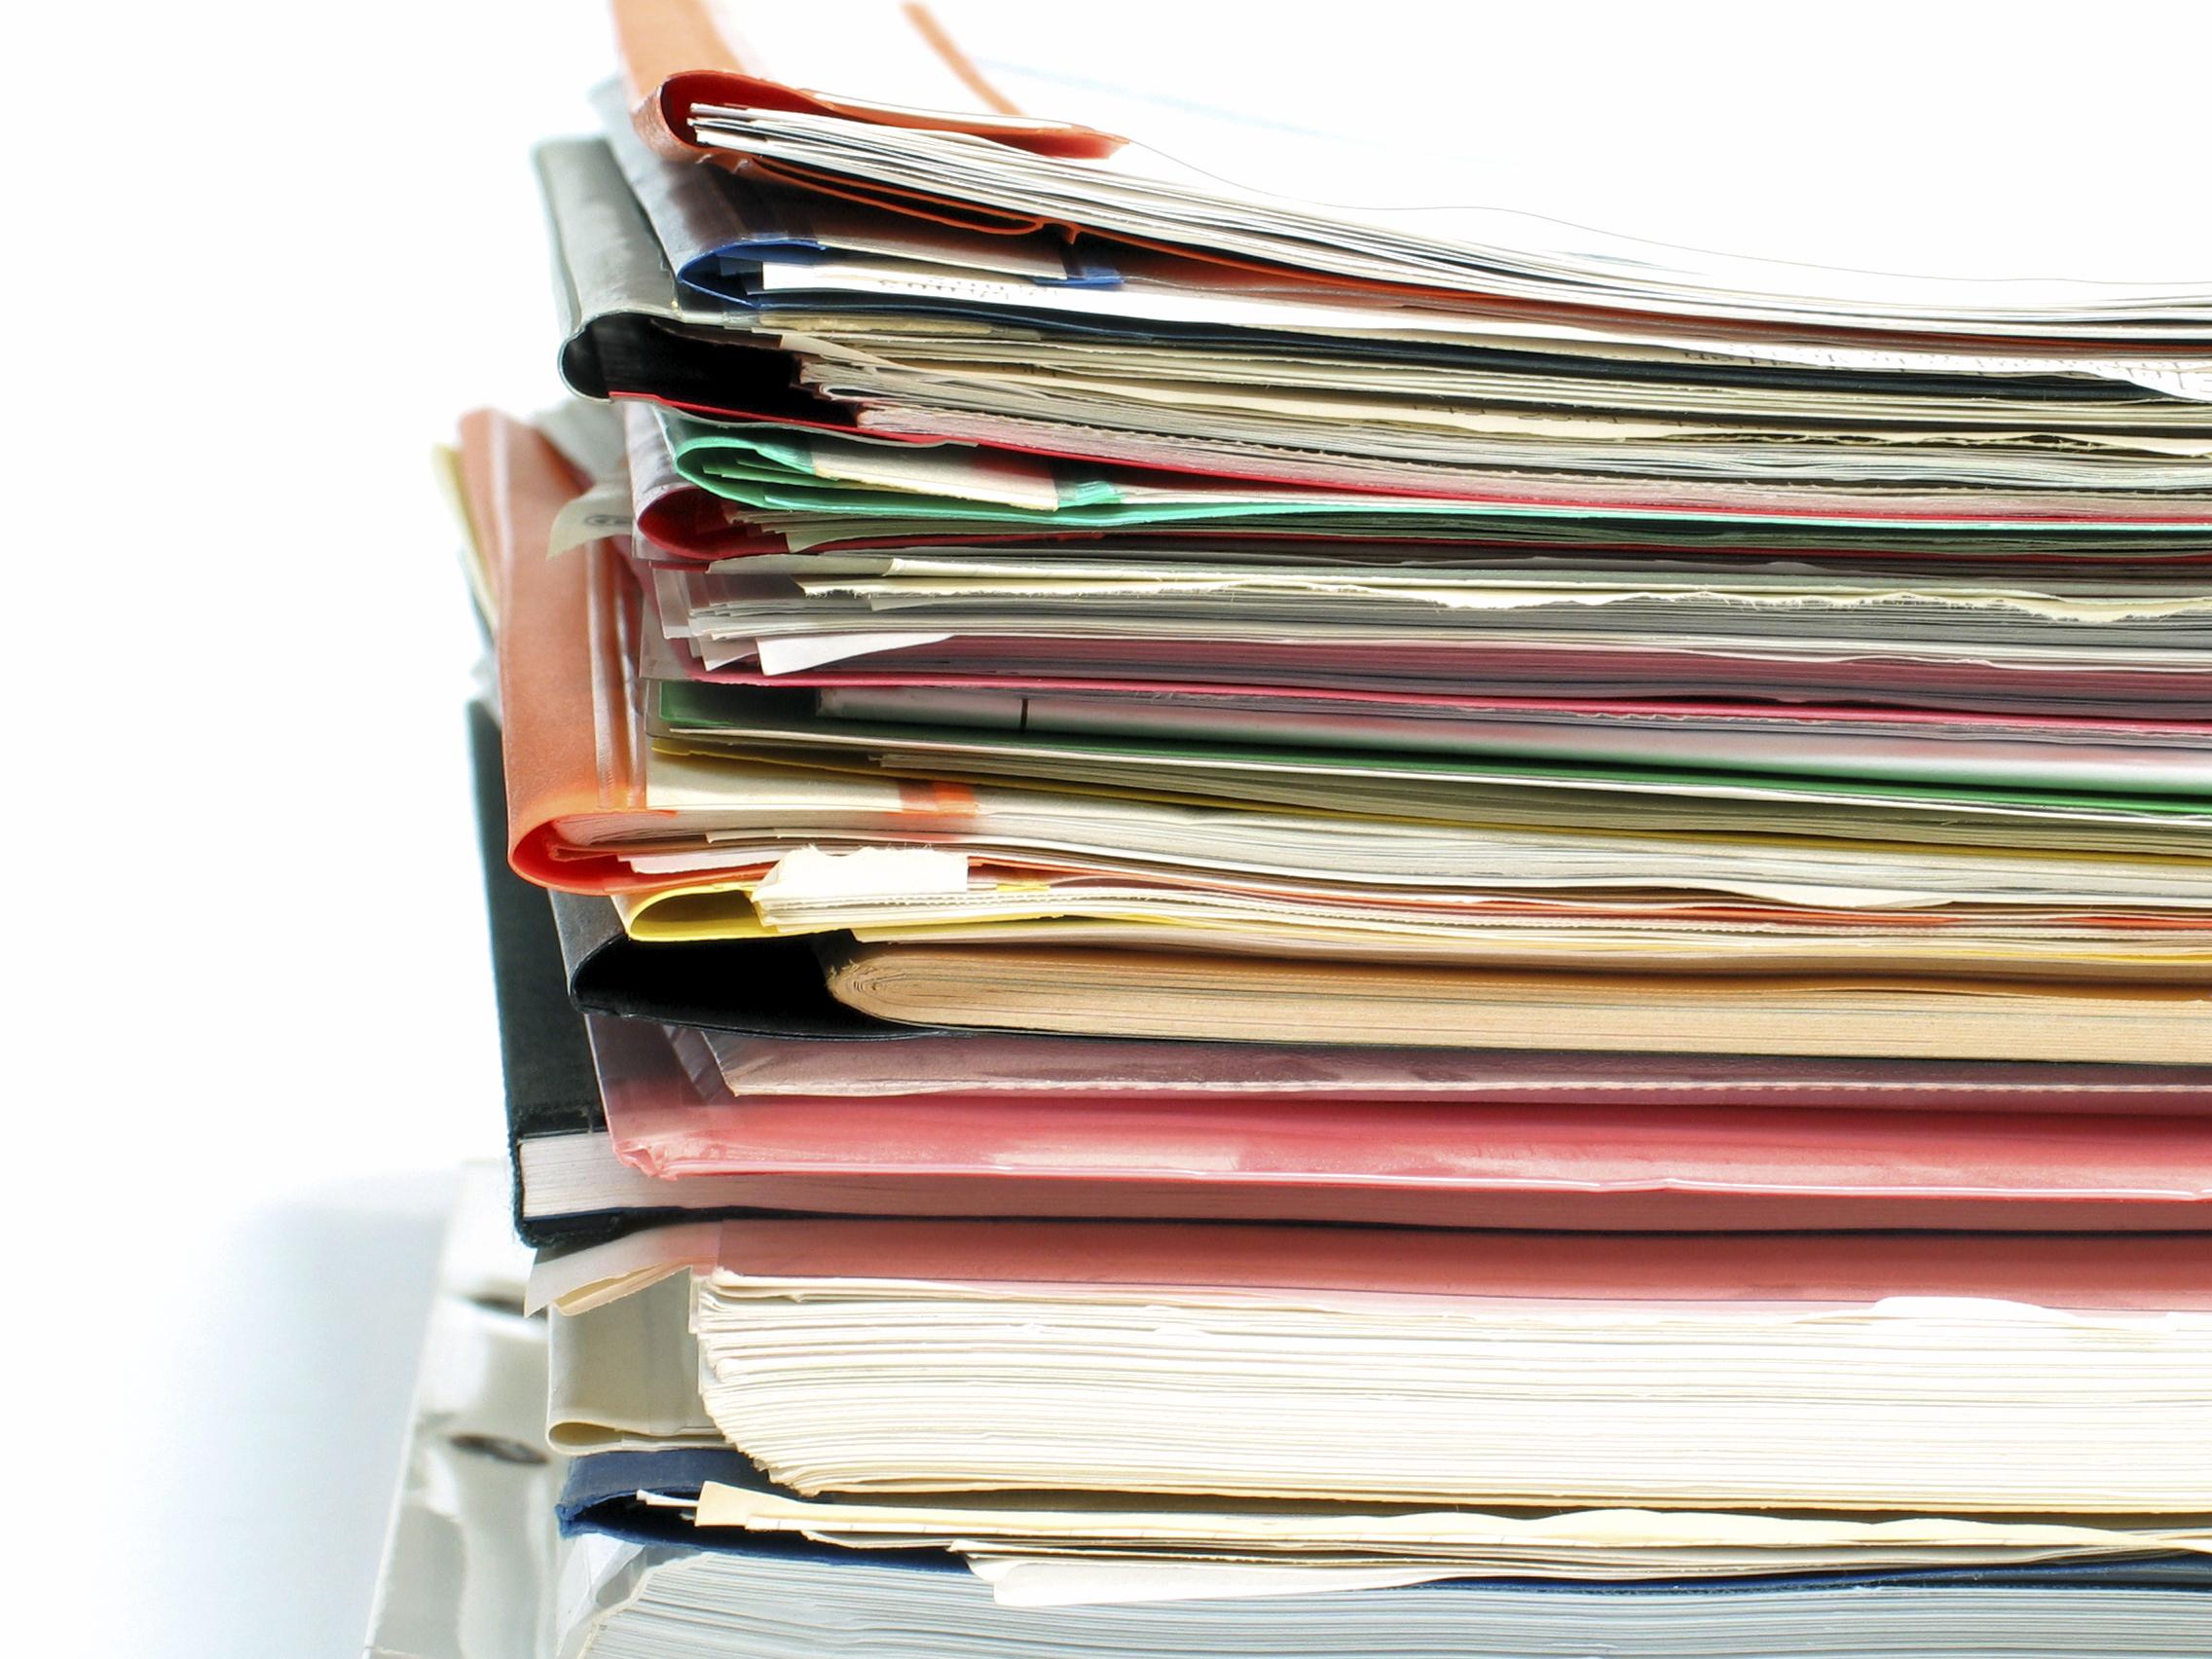 paper-stacks